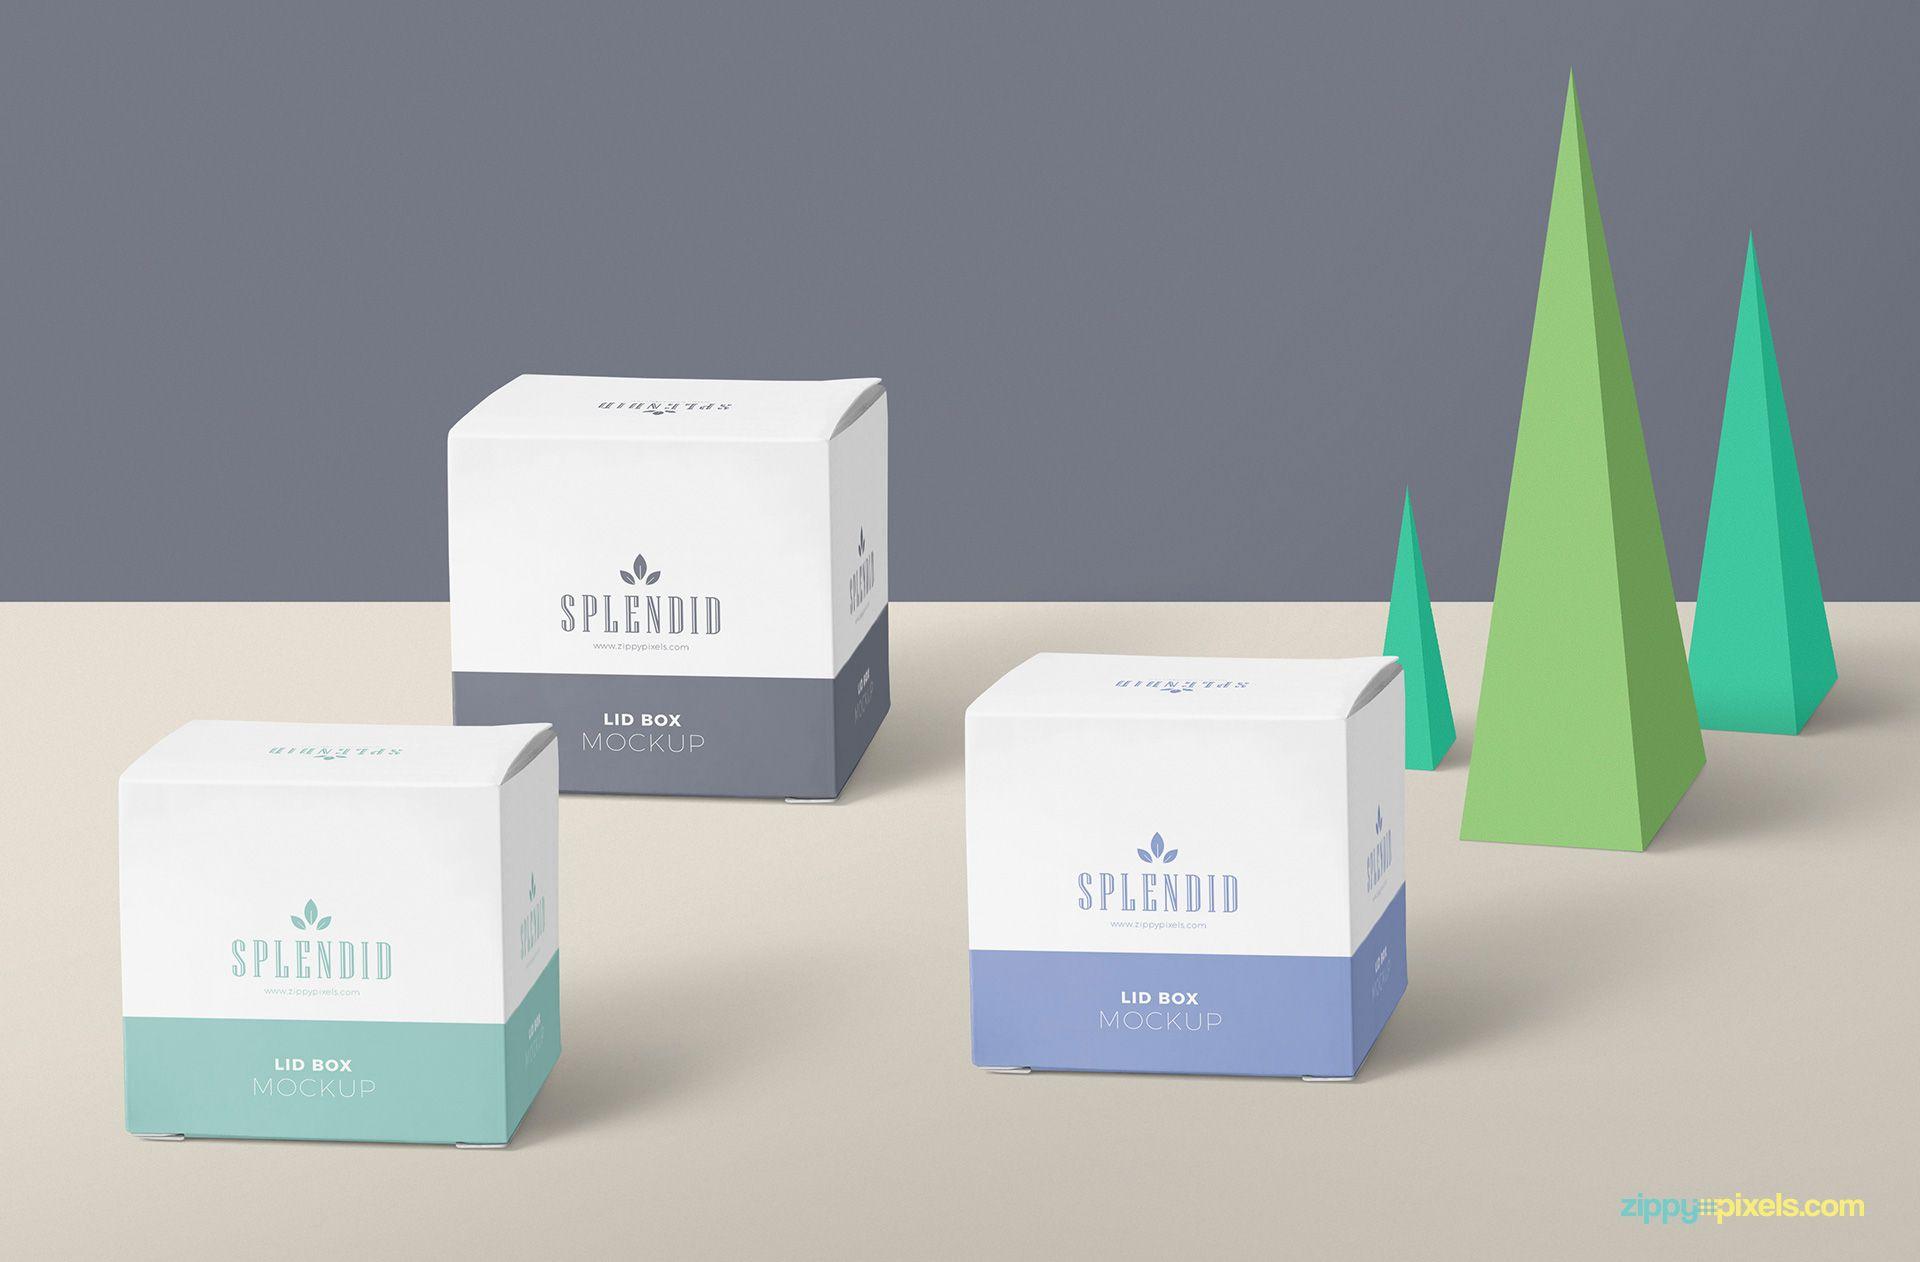 Download Free Paper Box Mockup Psd Zippypixels Free Packaging Mockup Box Mockup Paper Box